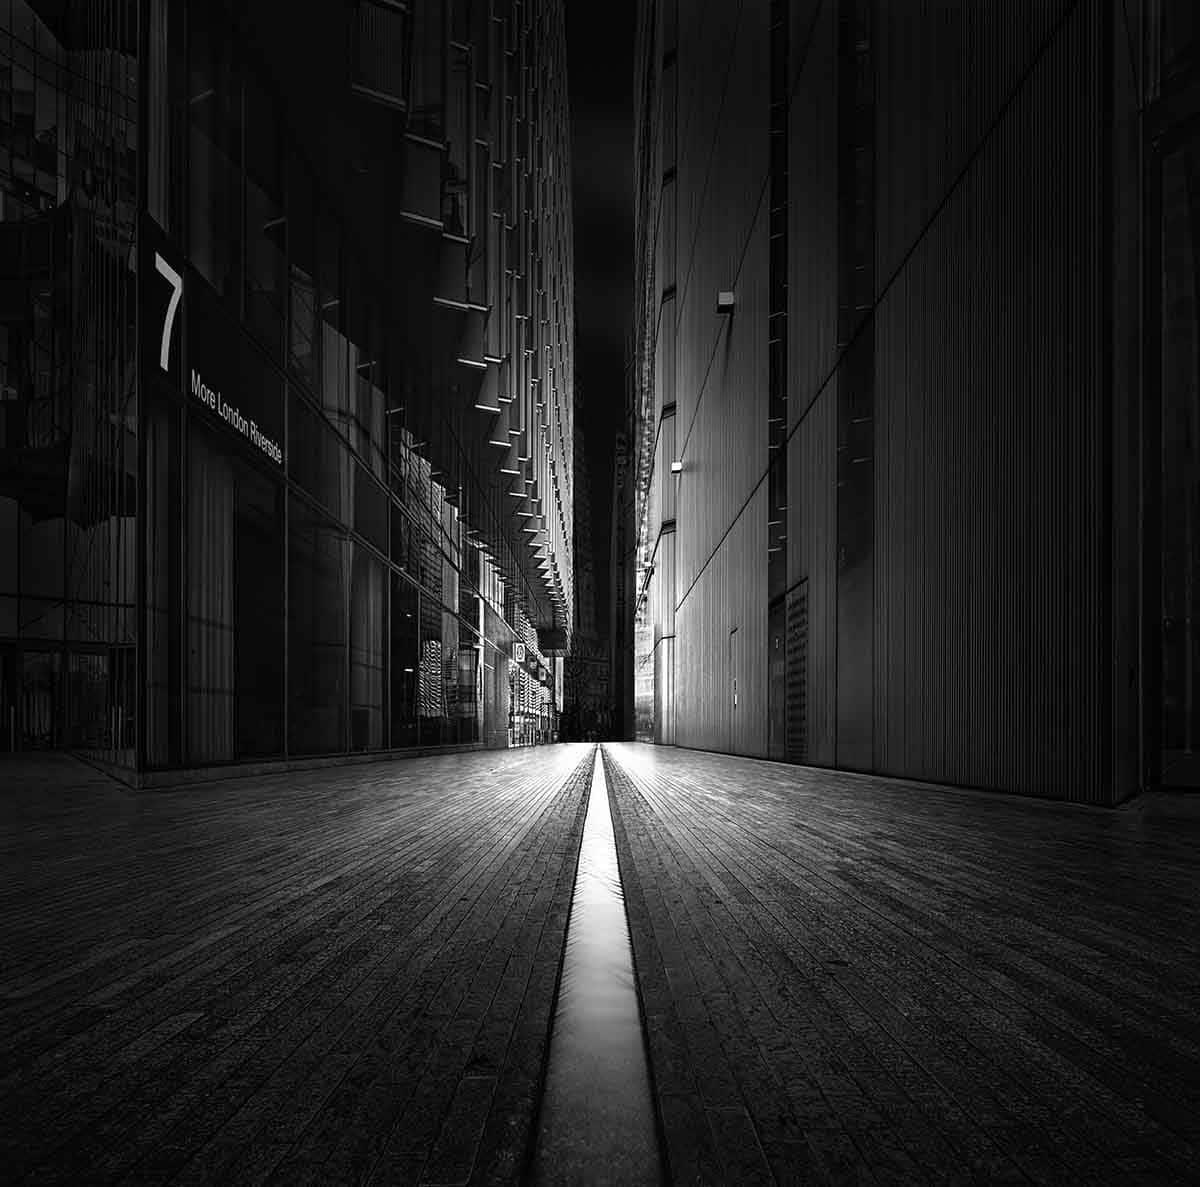 Equivalents II - More London © Julia Anna Gospodarou 2015